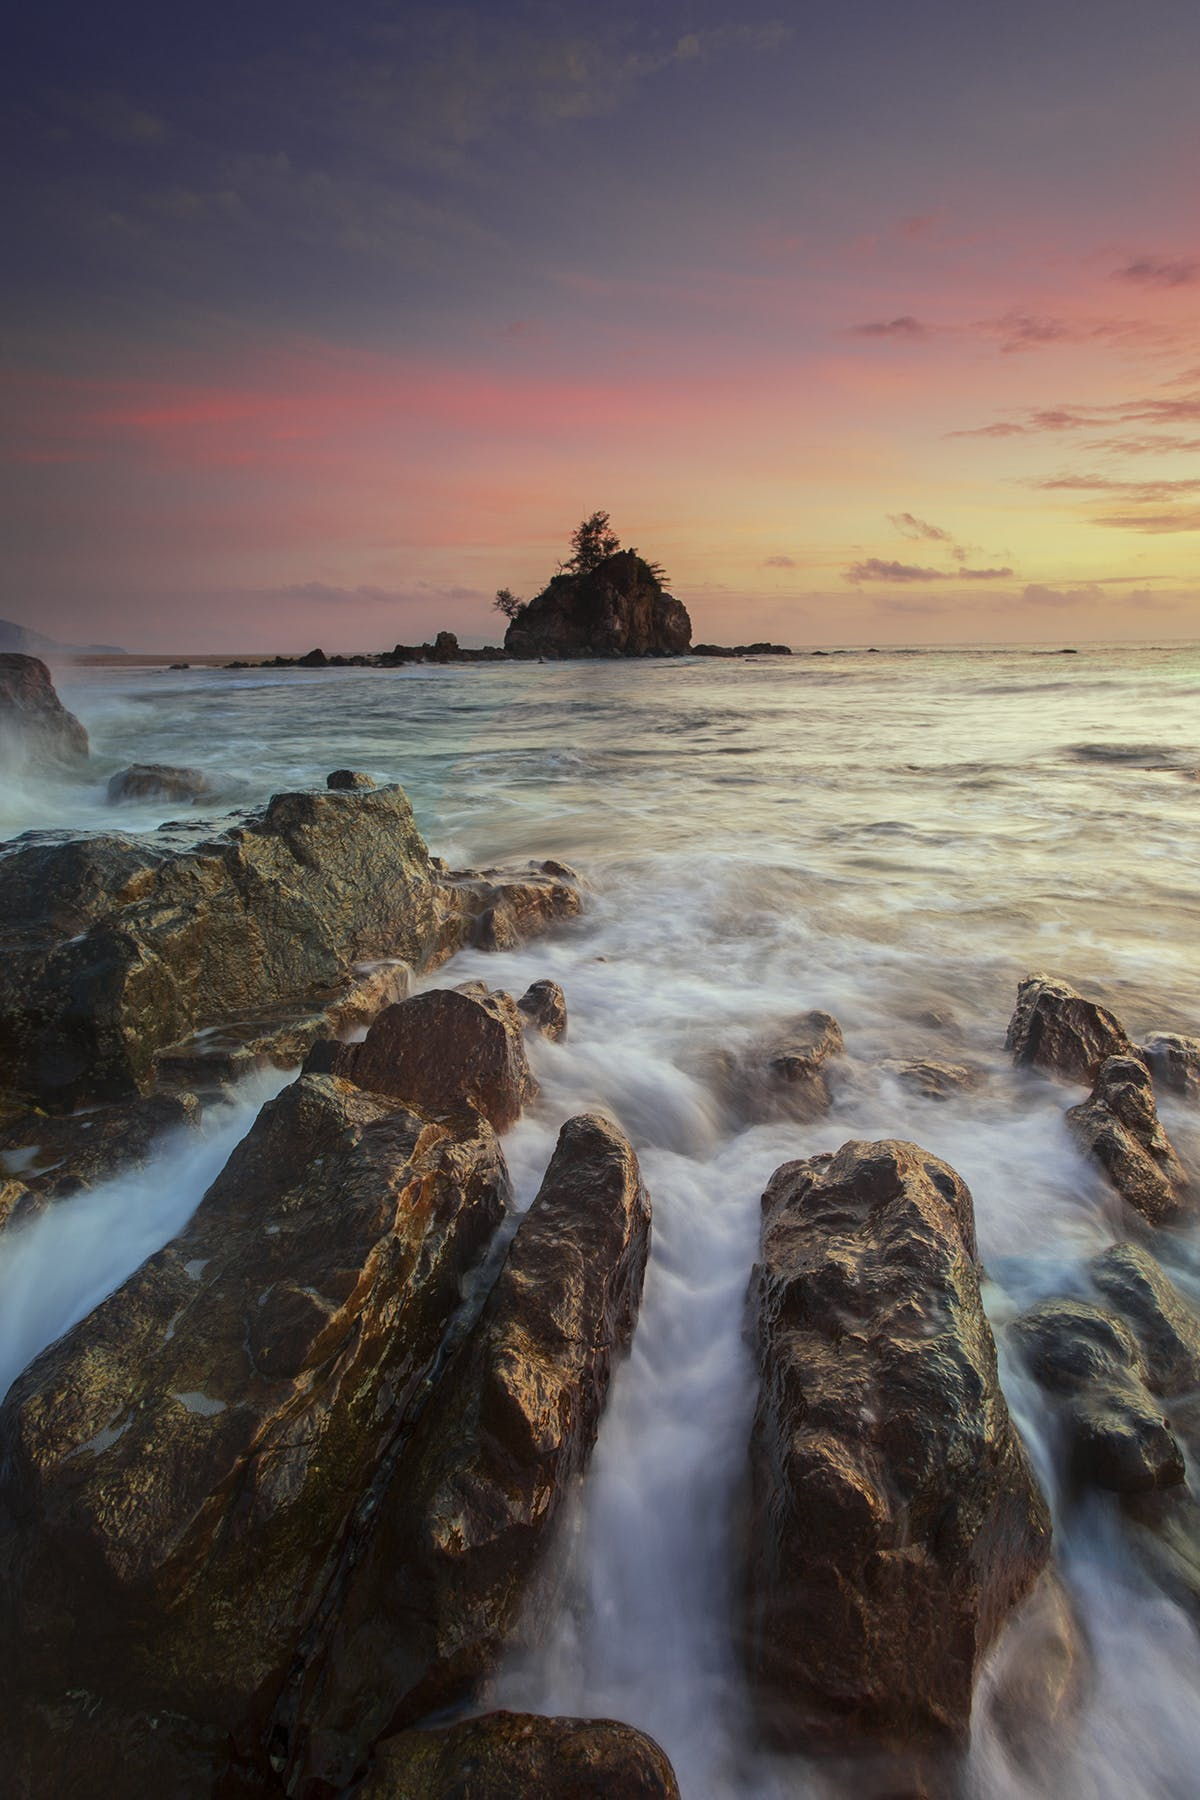 Running Water on Brown Rocks during Yellow Sunset